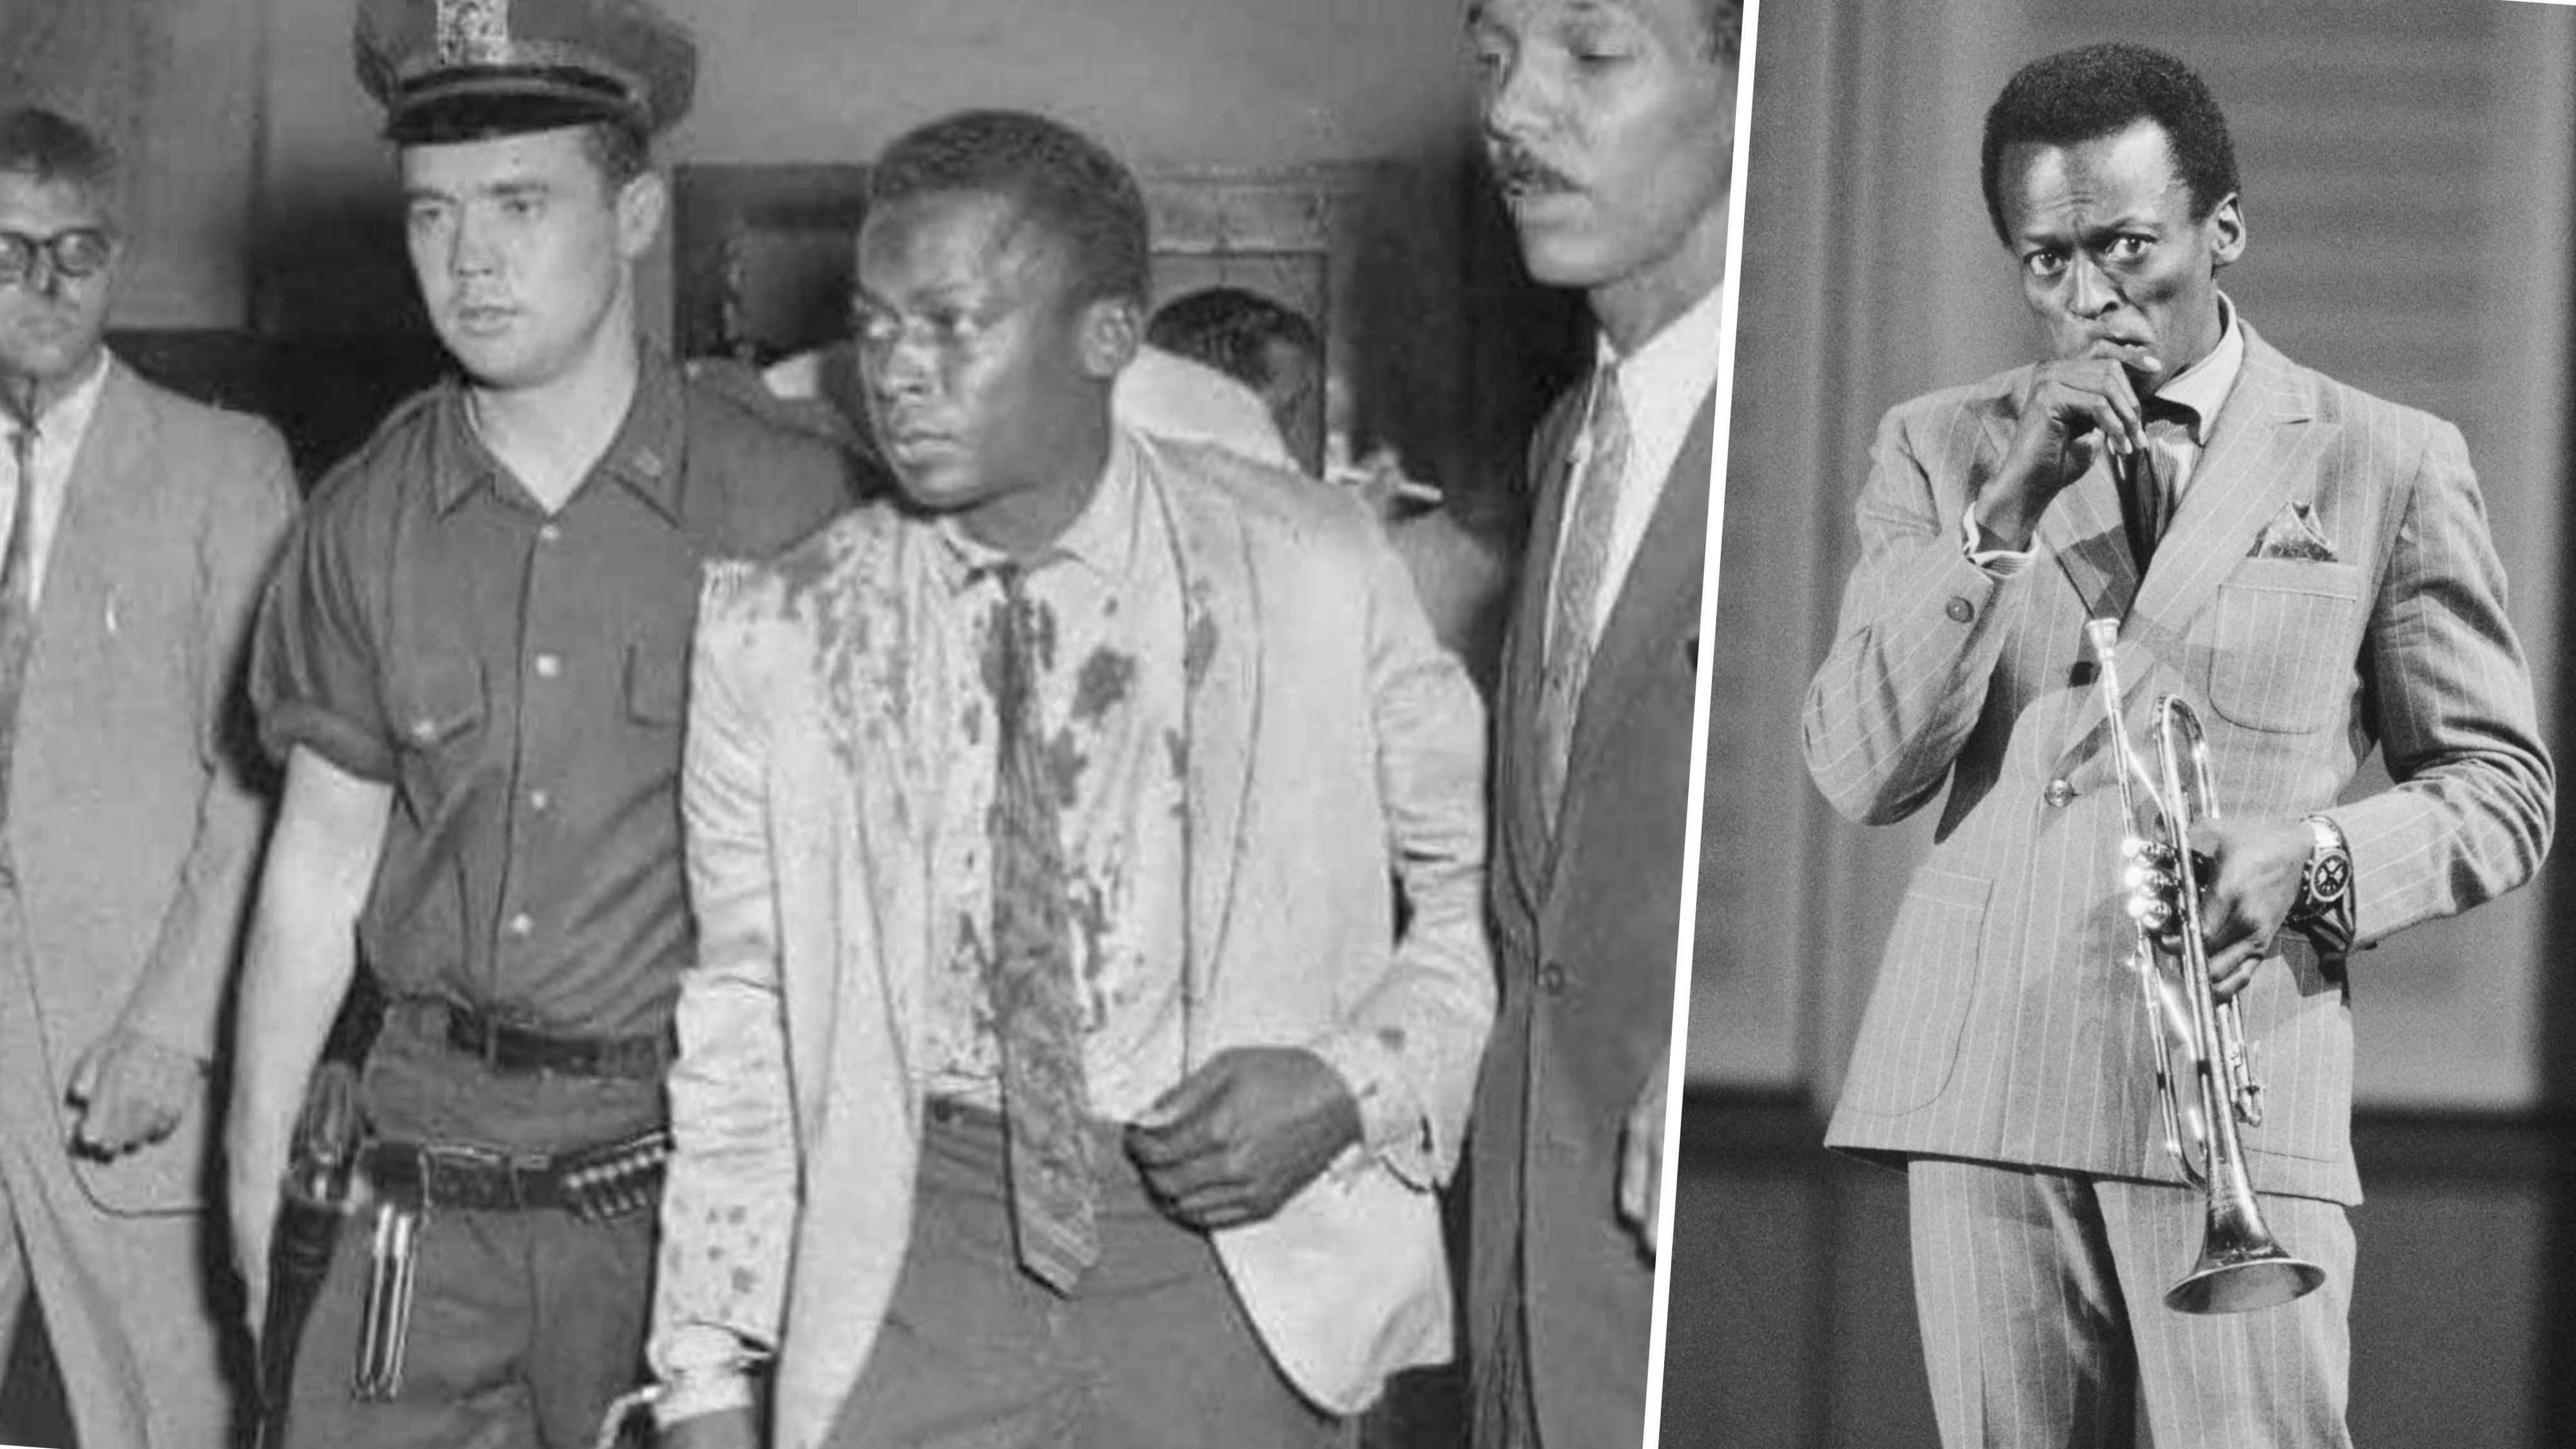 Jazz trumpeter Miles Davis was victim of an unprovoked police assault in 1959